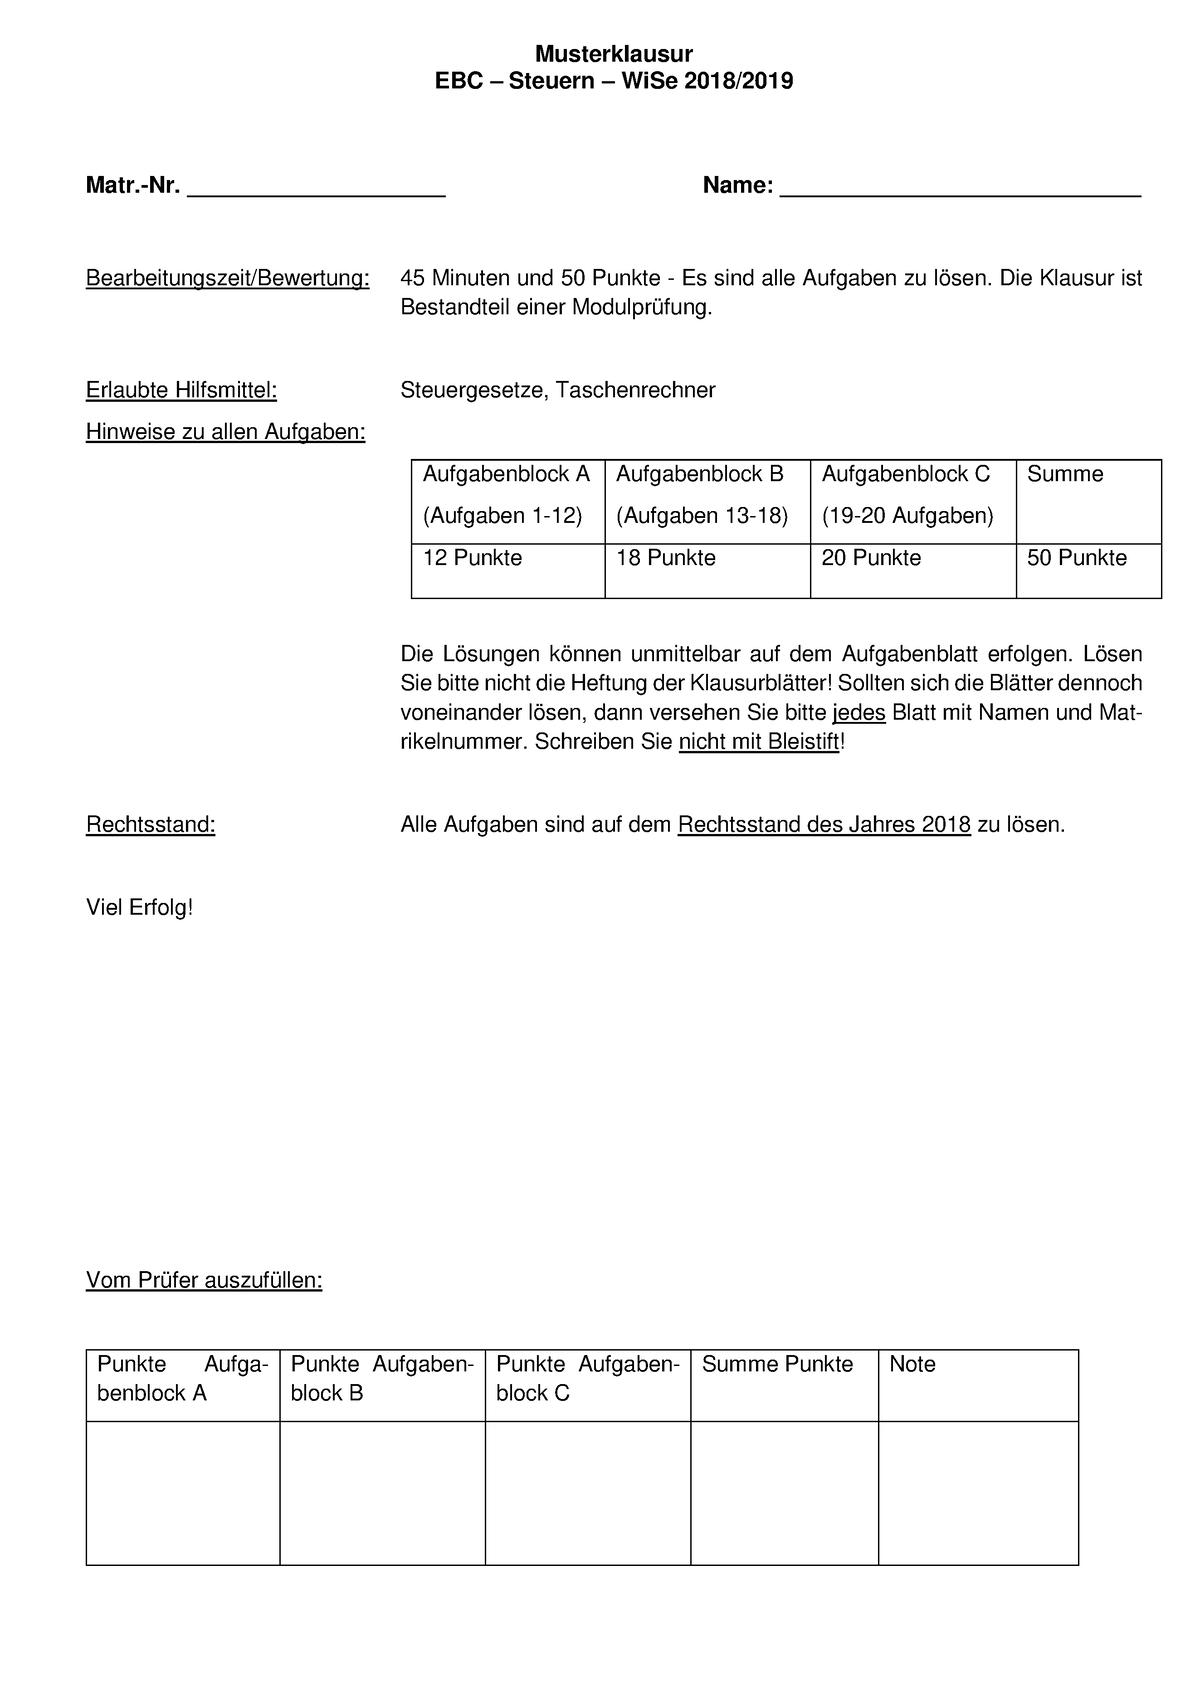 Musterklausur Steuern I 91111 2 Fh Dortmund Studocu